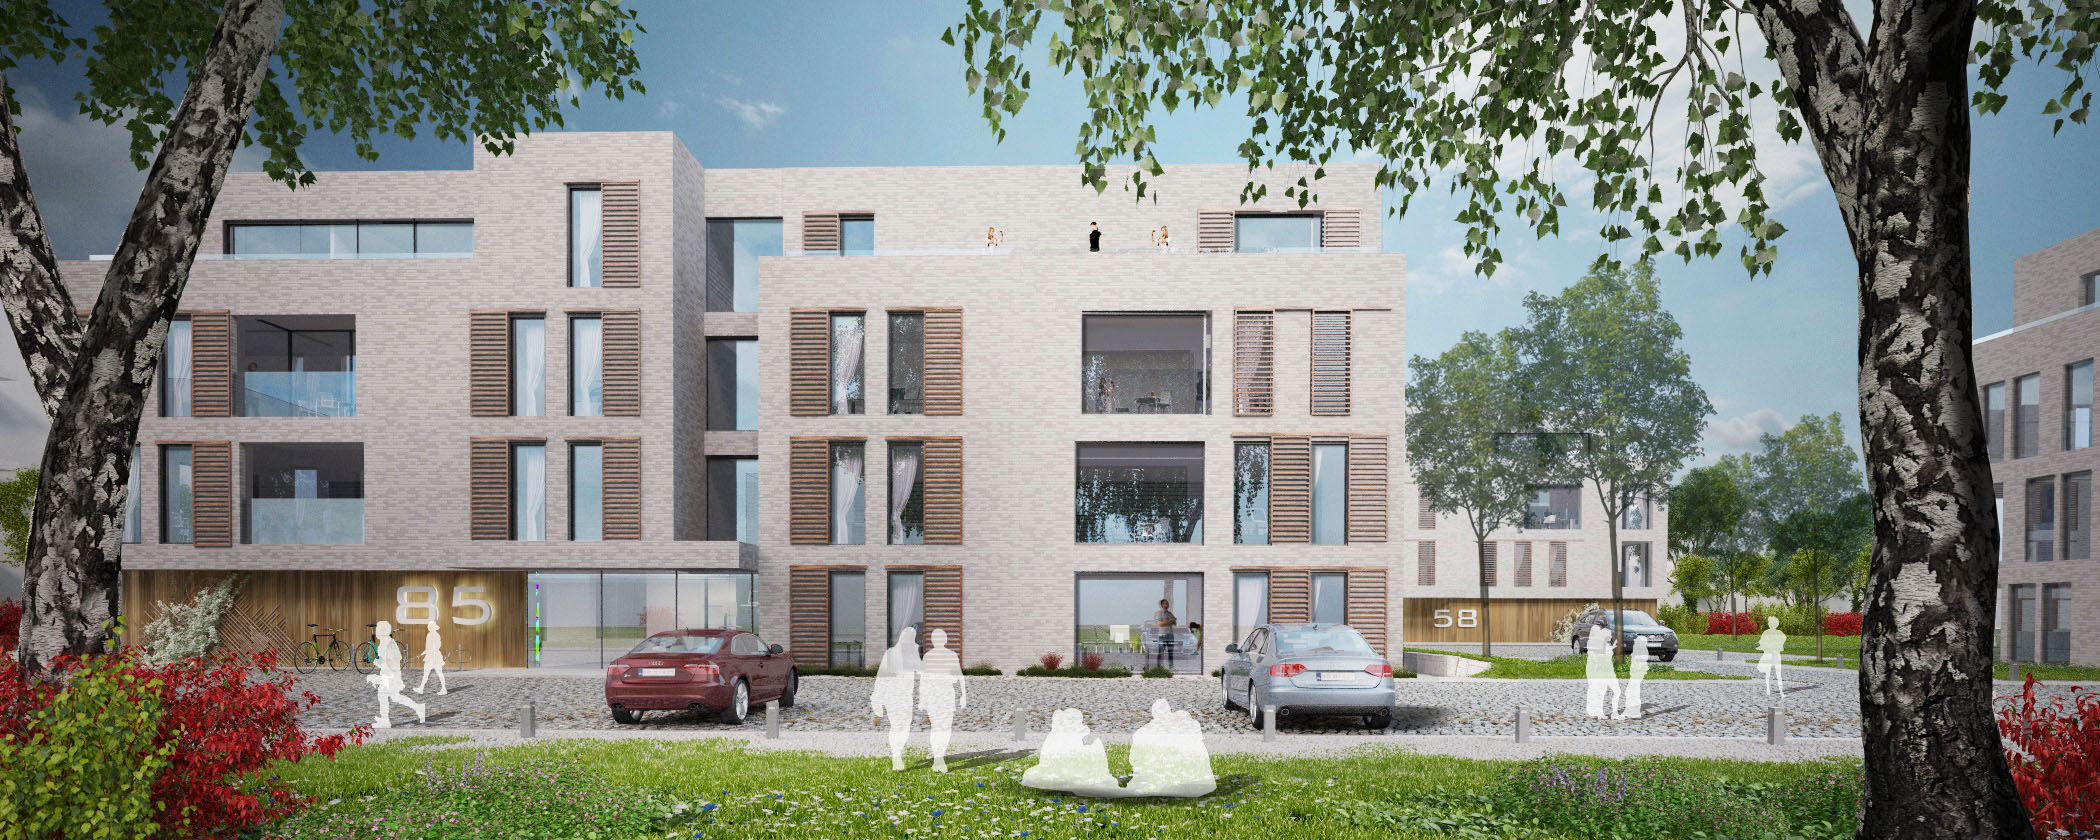 Appartementen Molenstaete Breda